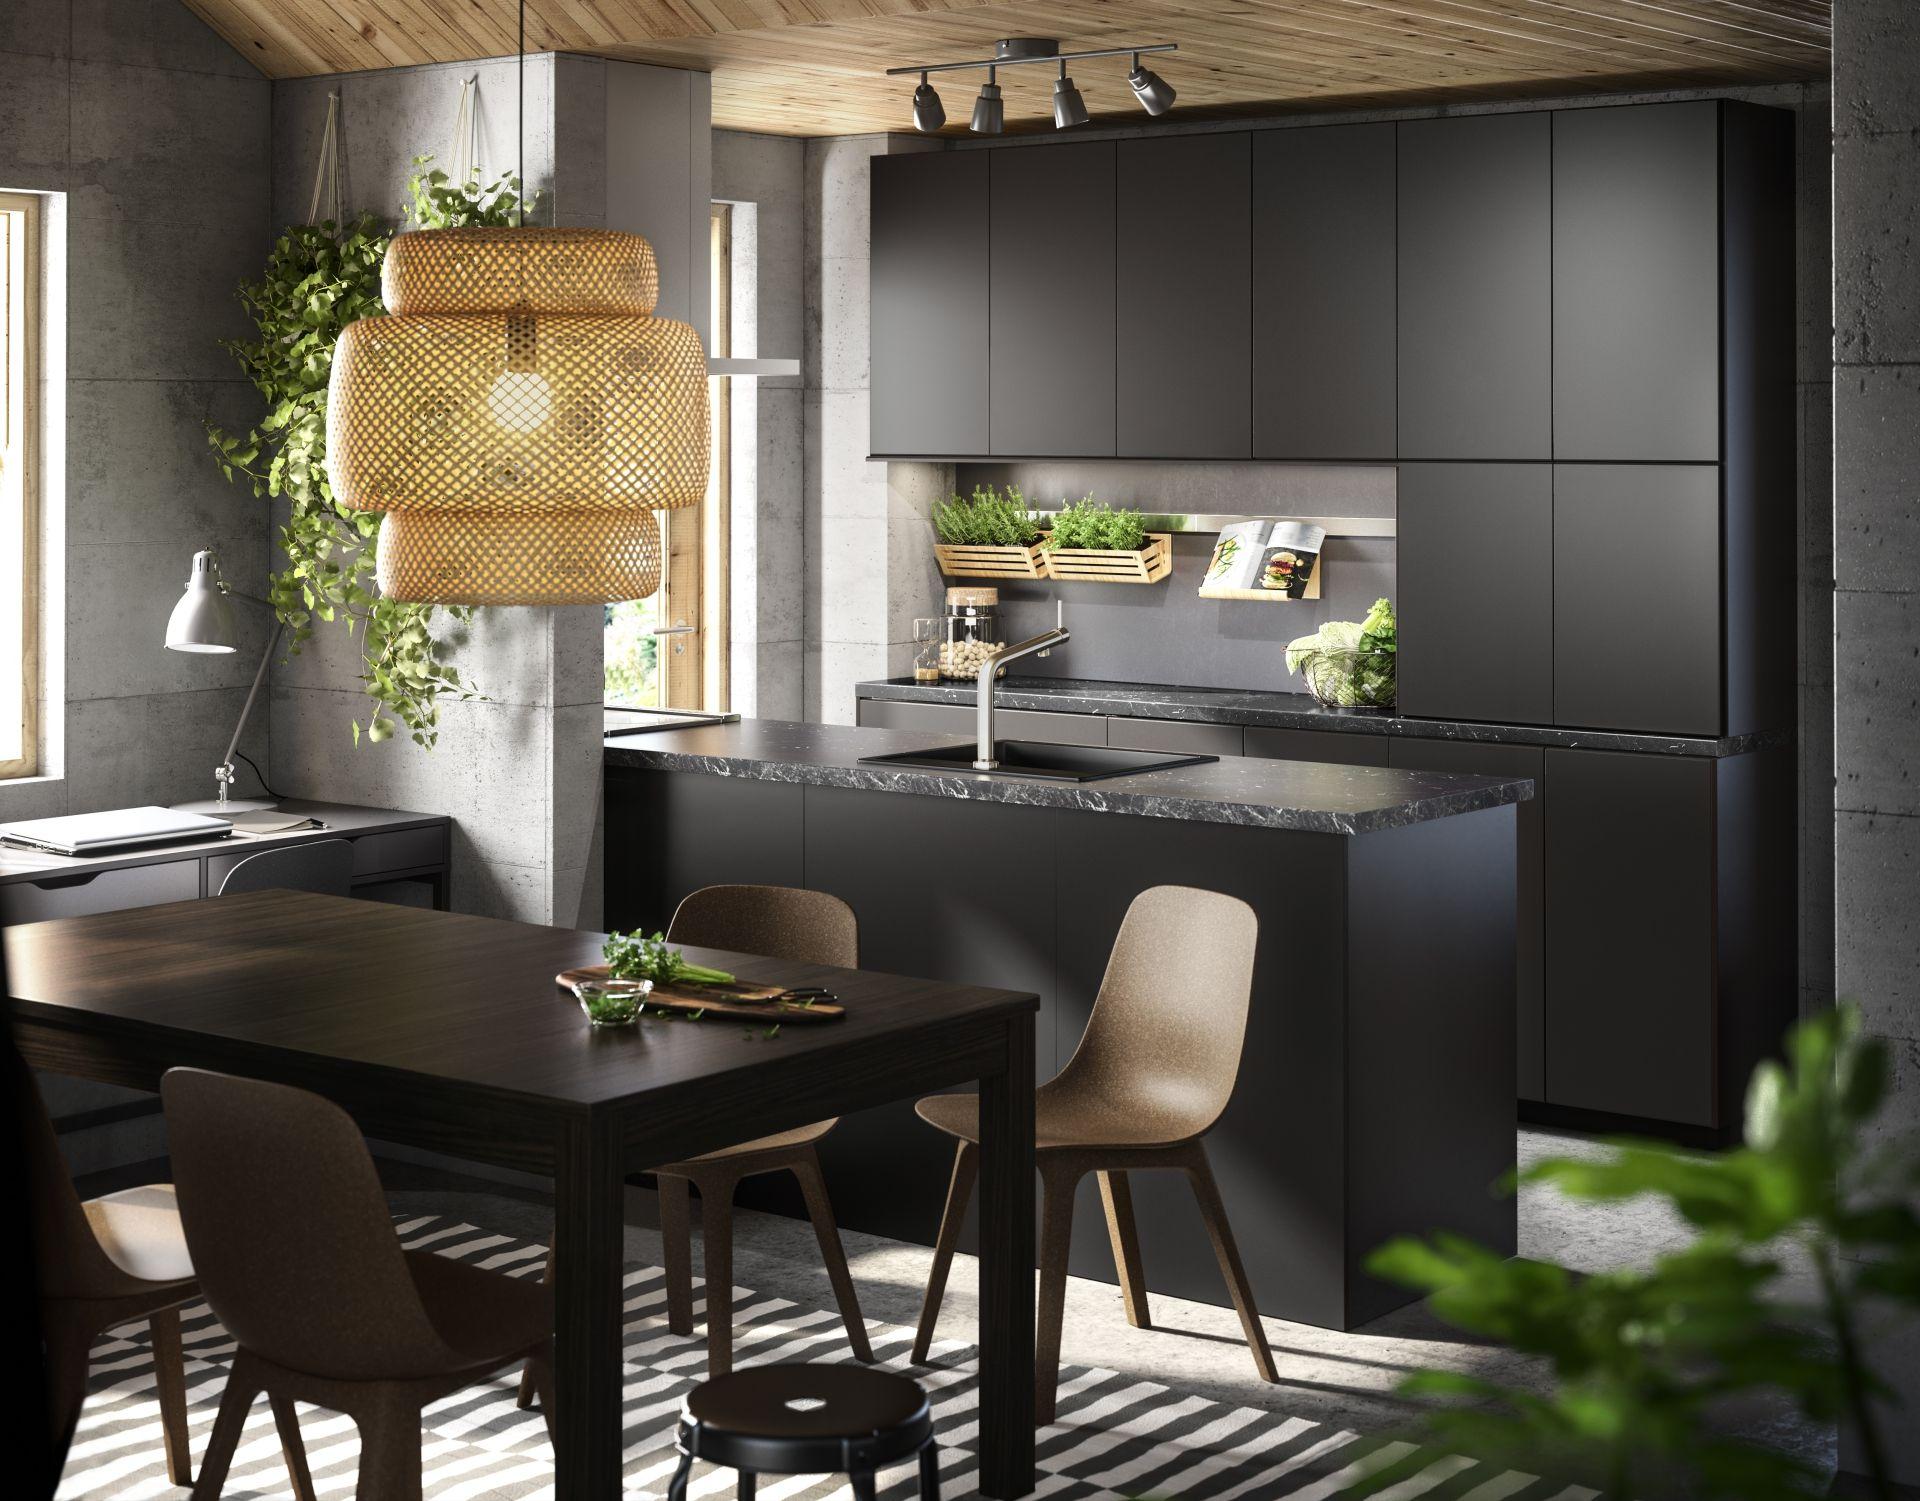 METOD/KUNGSBACKA keuken | IKEA IKEAnl IKEAnederland inspiratie ...